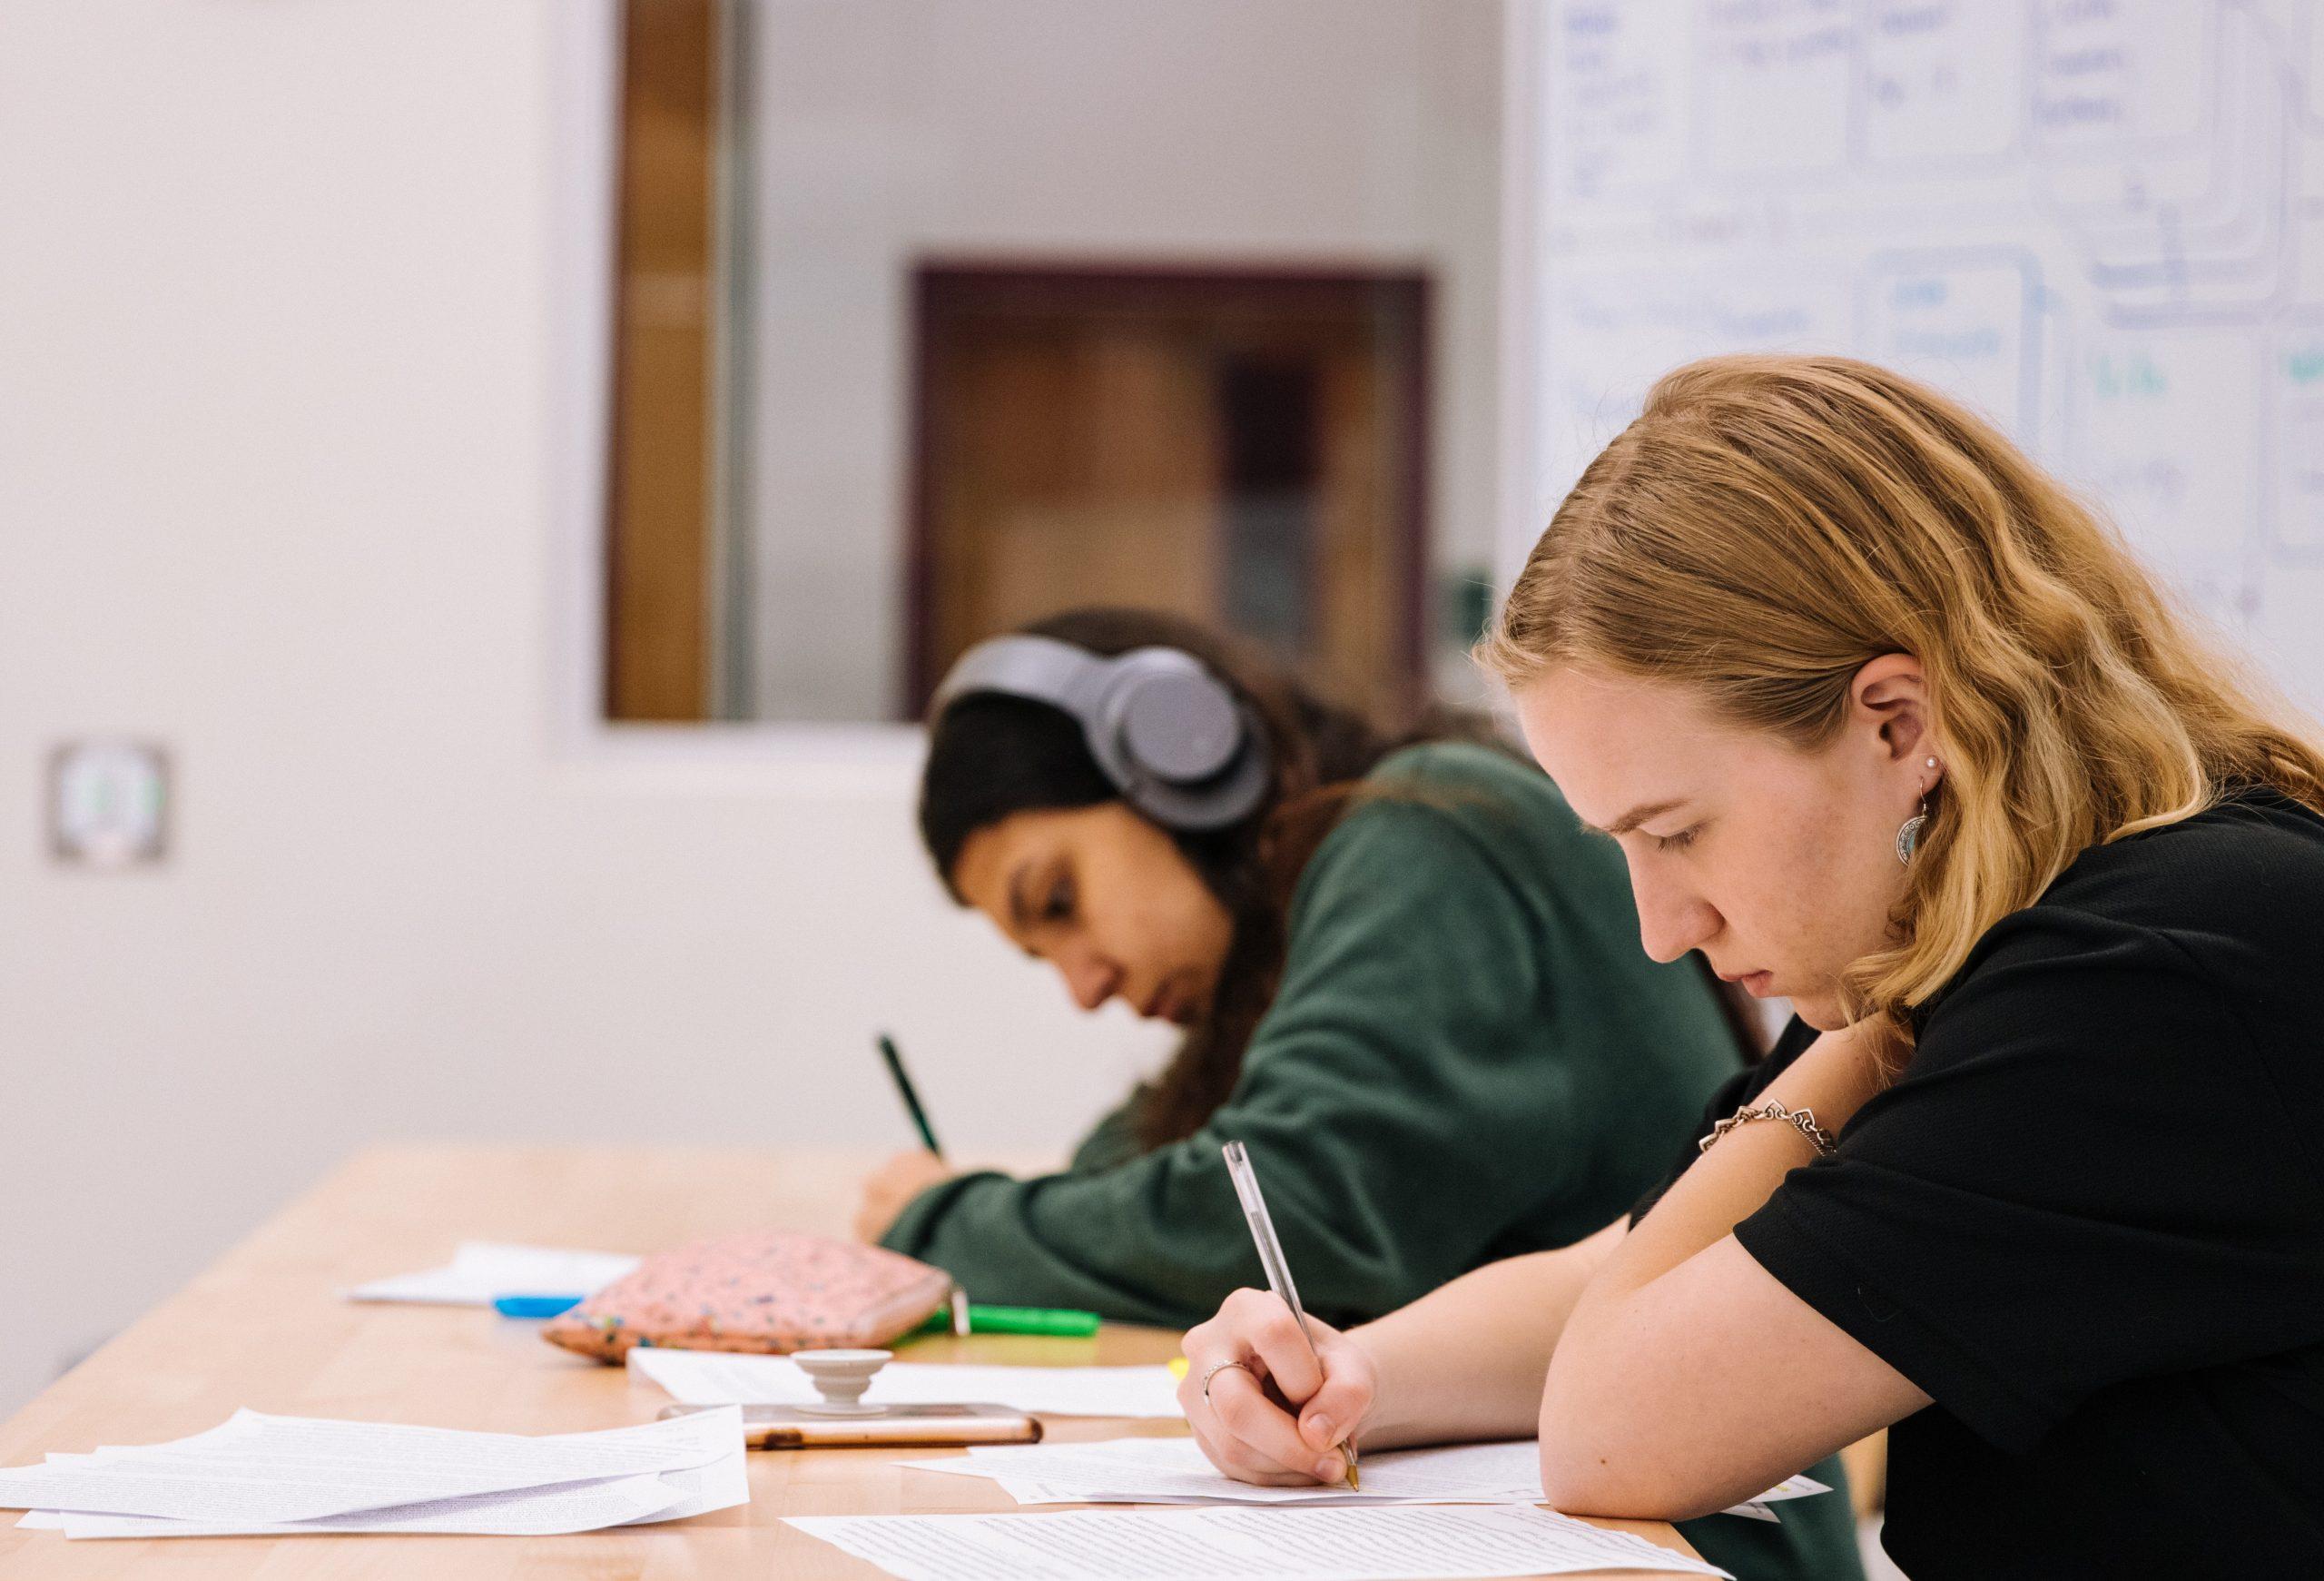 Fairmont Schools - Have I Really Failed?